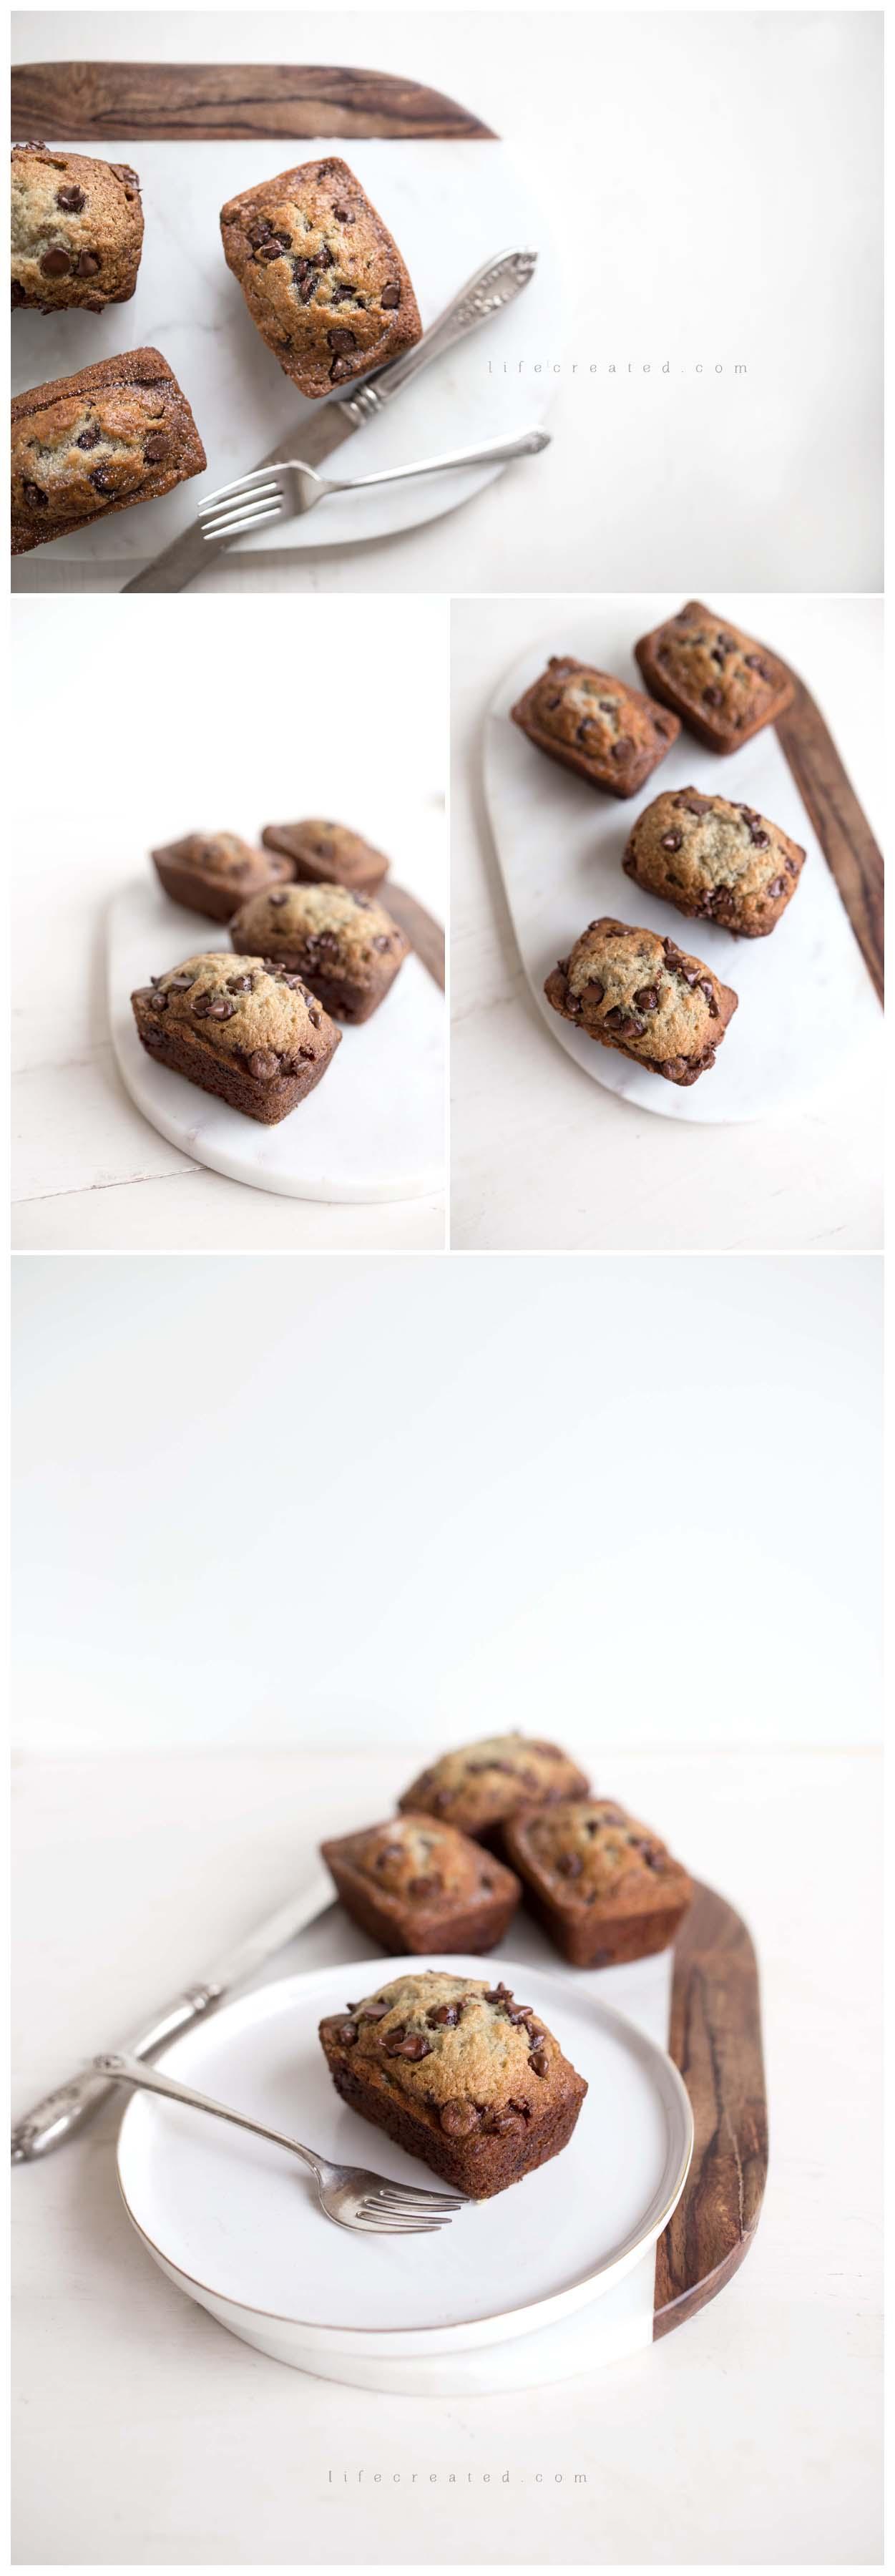 food photography, Chocolate chip banana bread